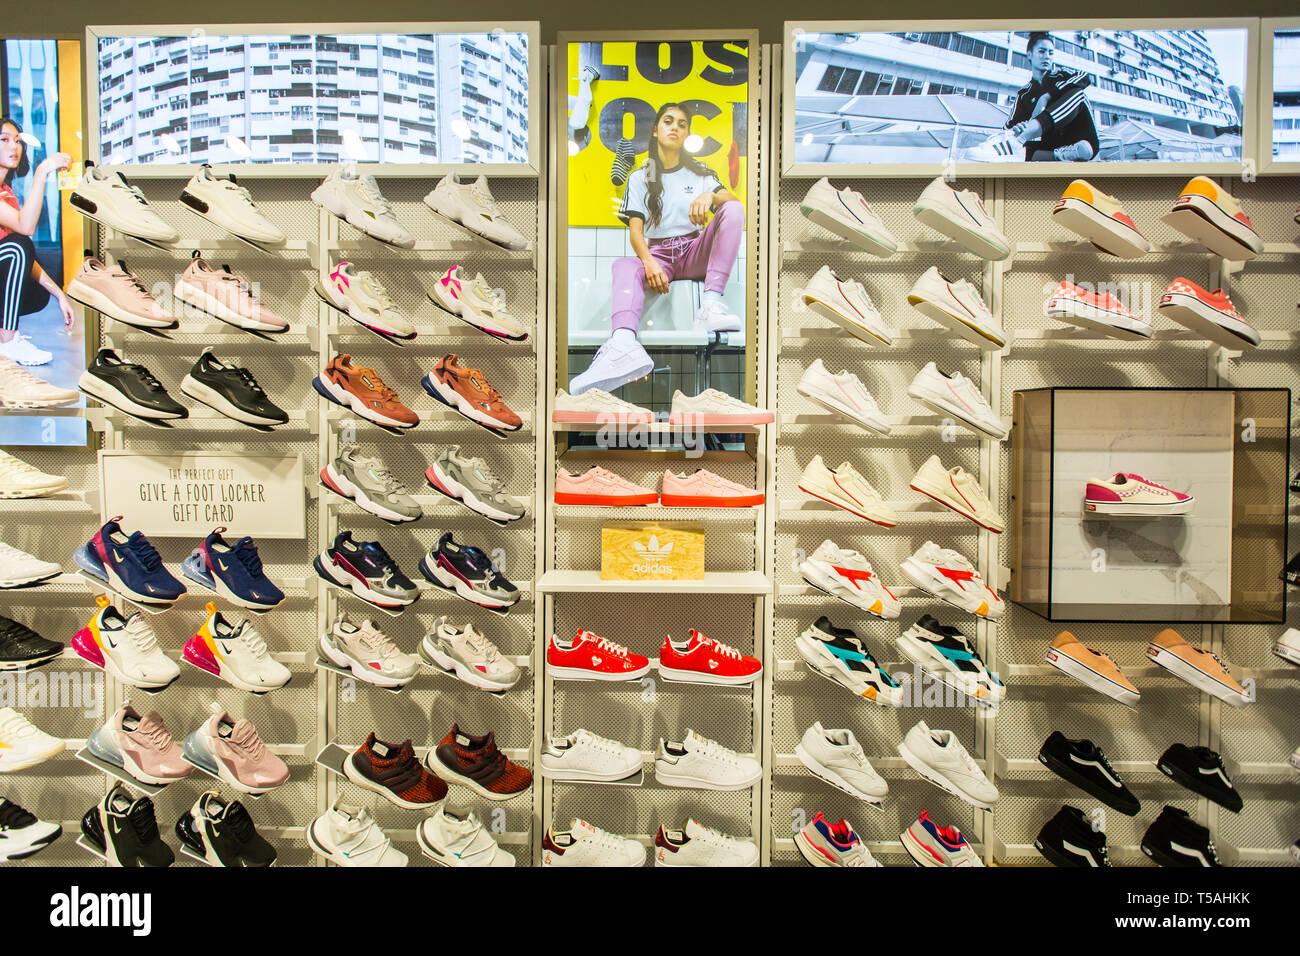 46ed48c01 Foot Locker Stock Photos   Foot Locker Stock Images - Alamy